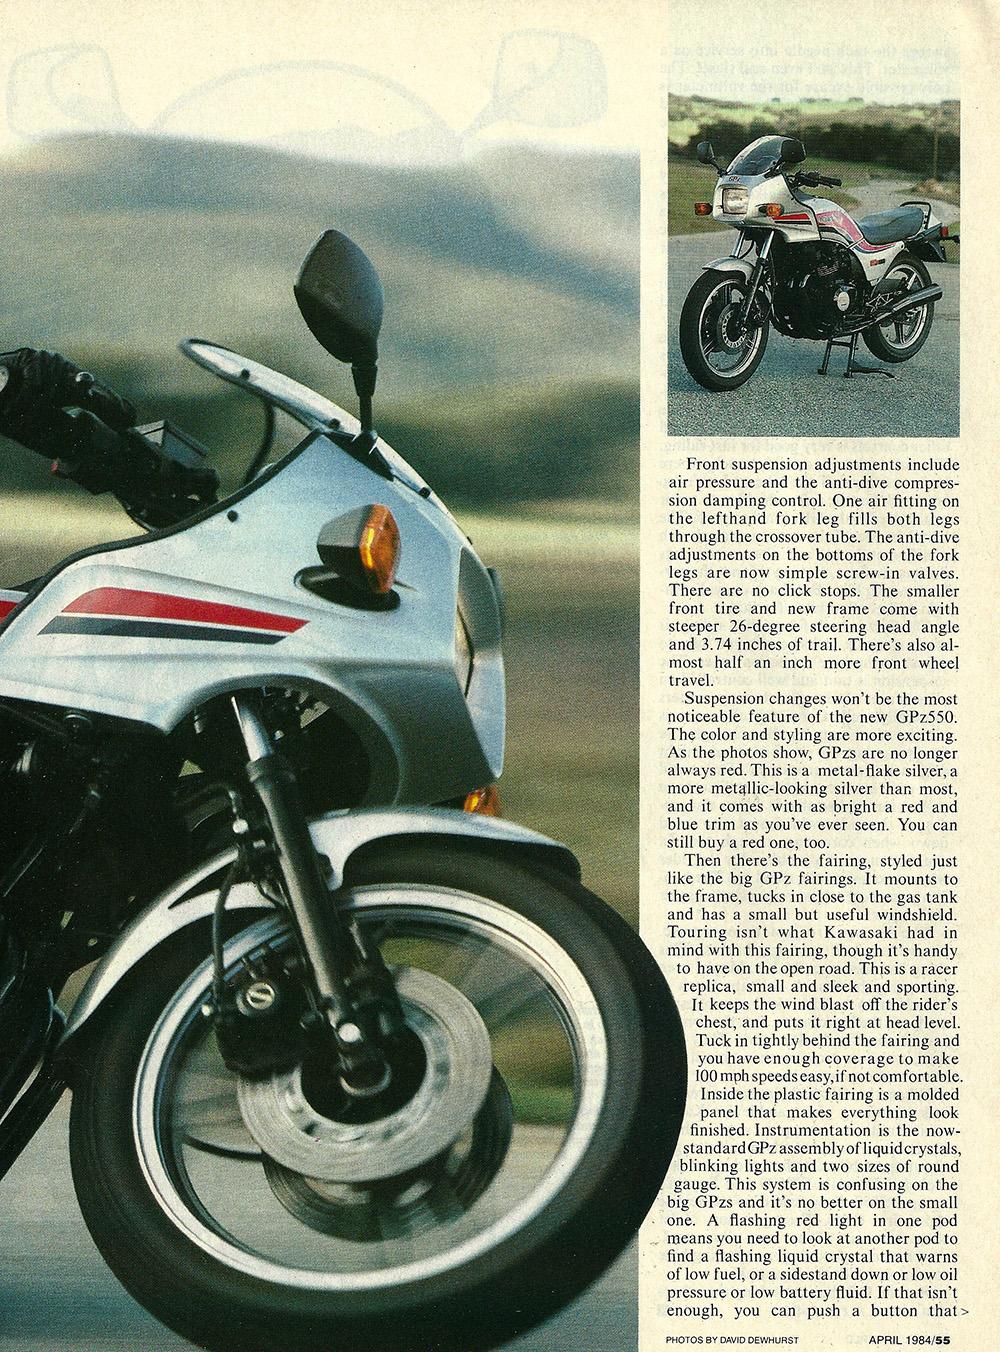 1984 Kawasaki GPz550 road test 04.jpg